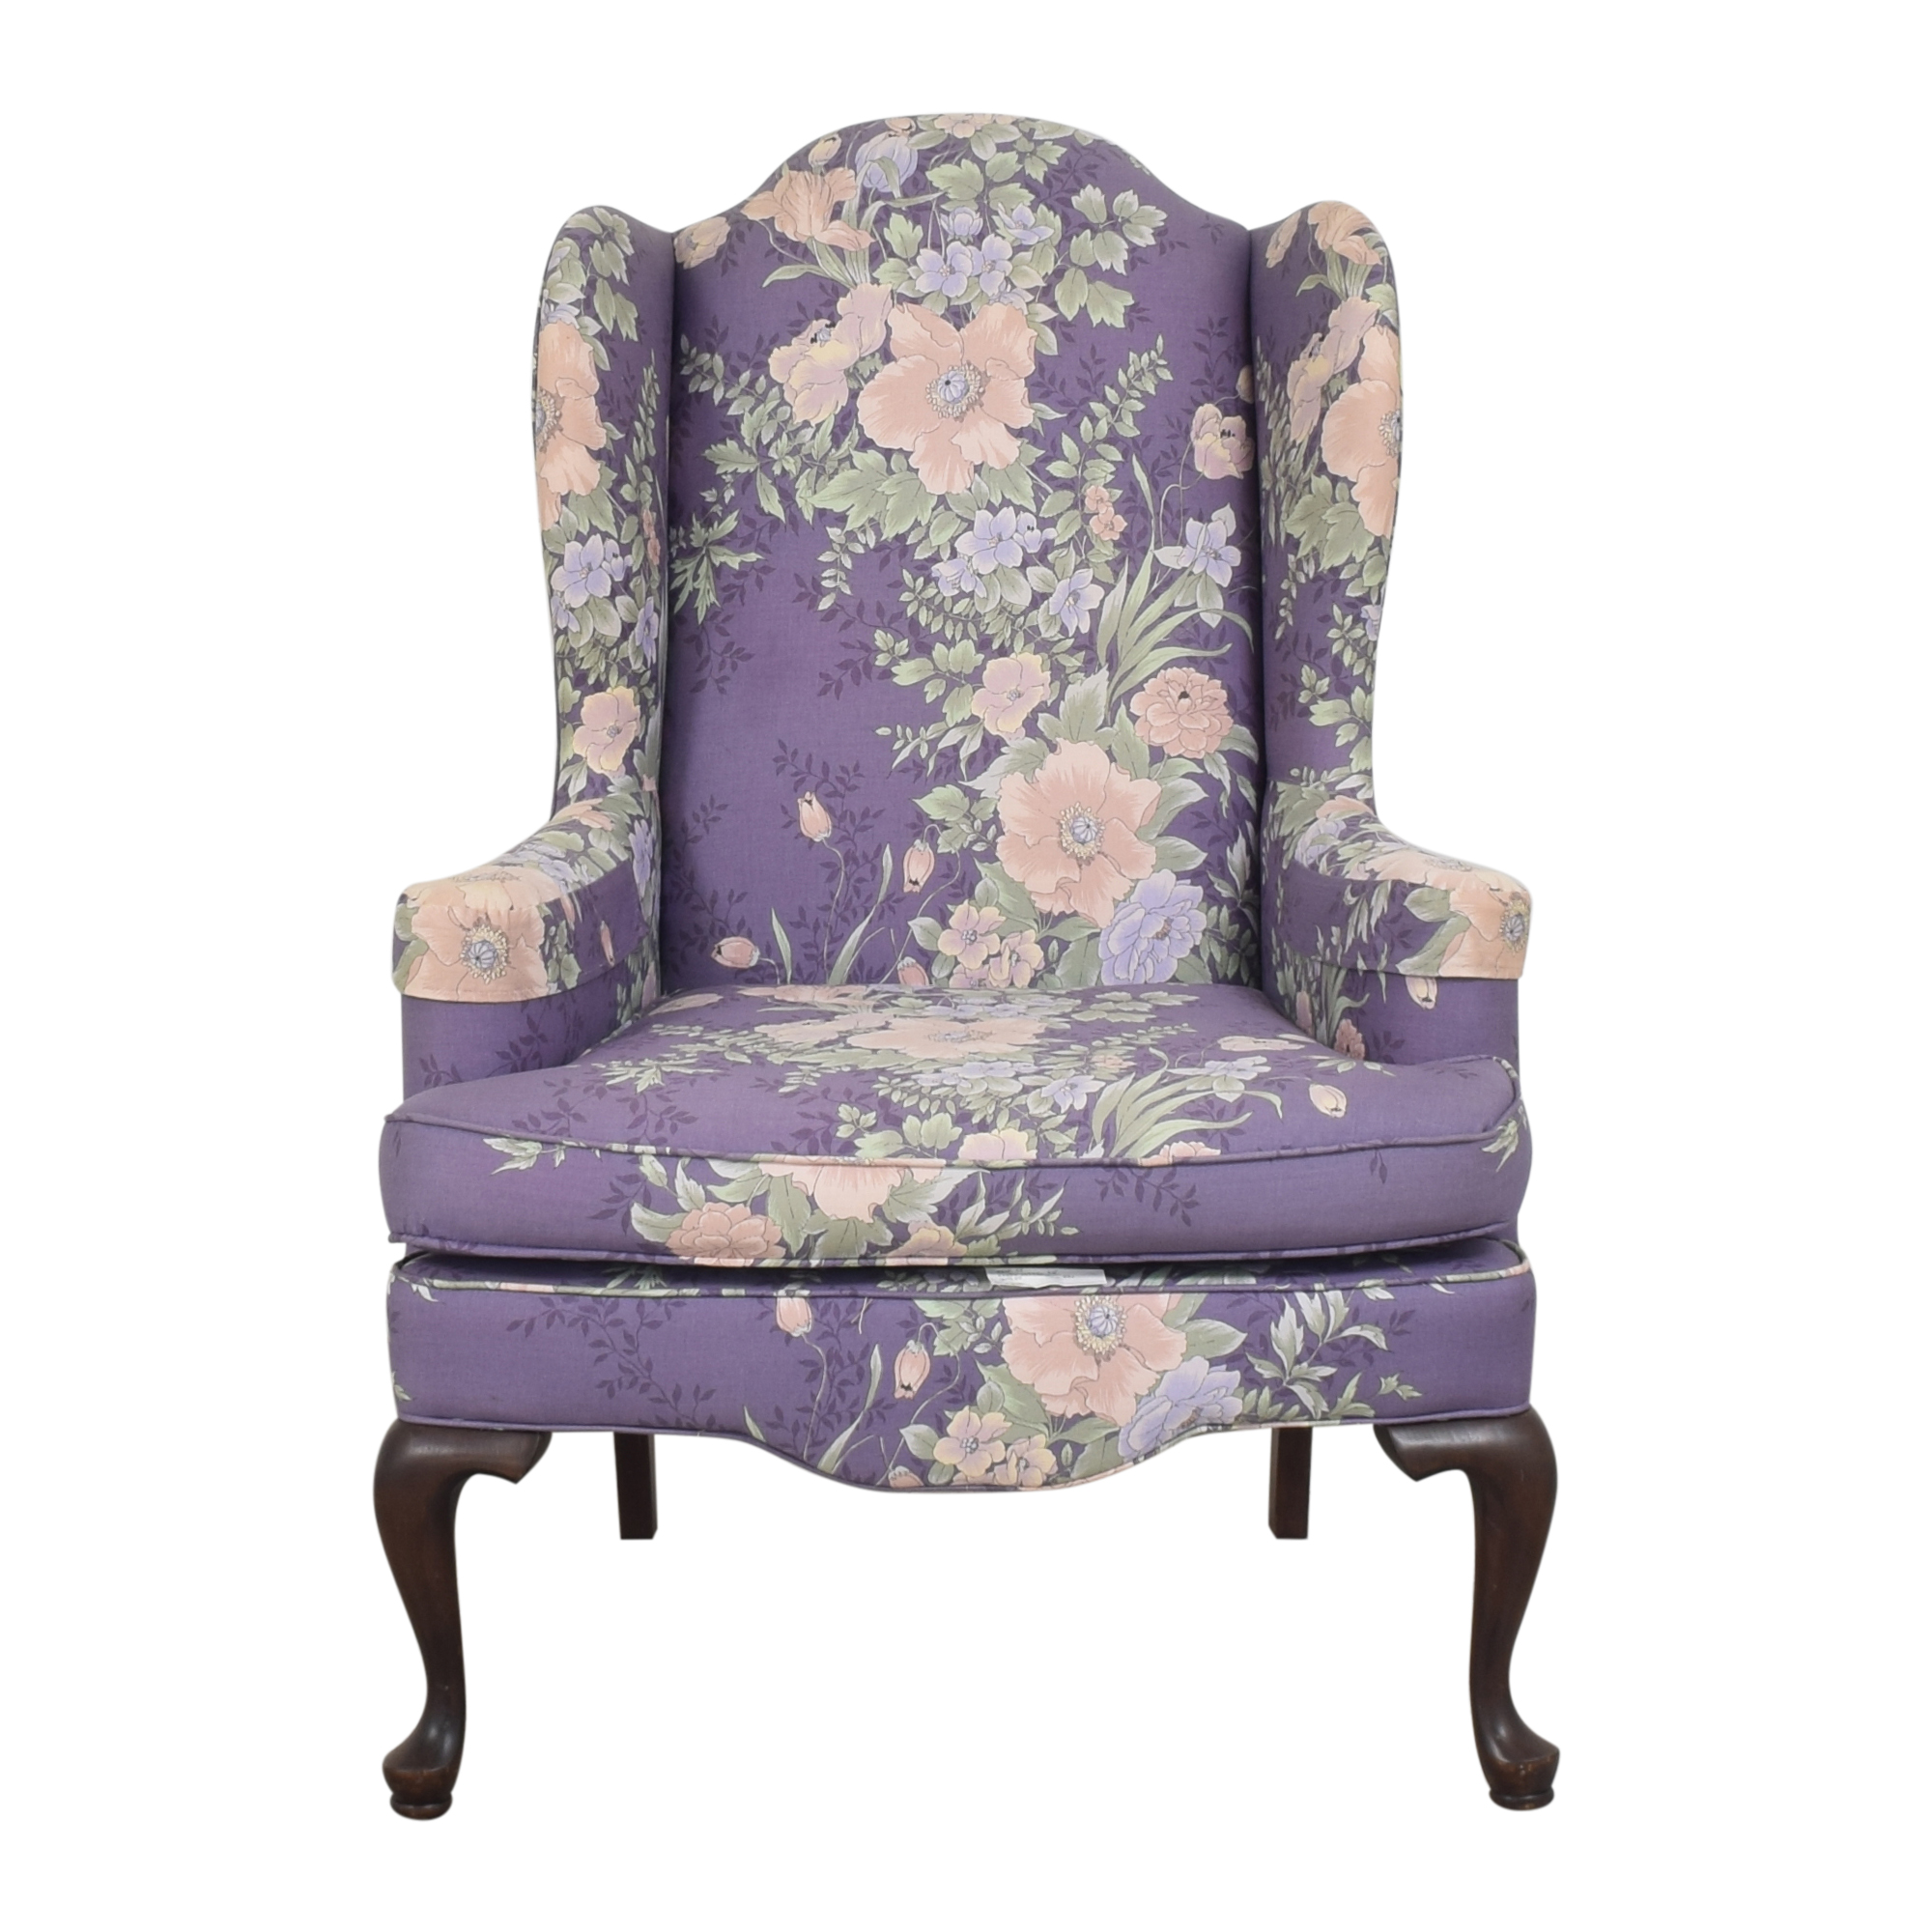 buy Ethan Allen Ethan Allen Traditional Classics Wing Chair online